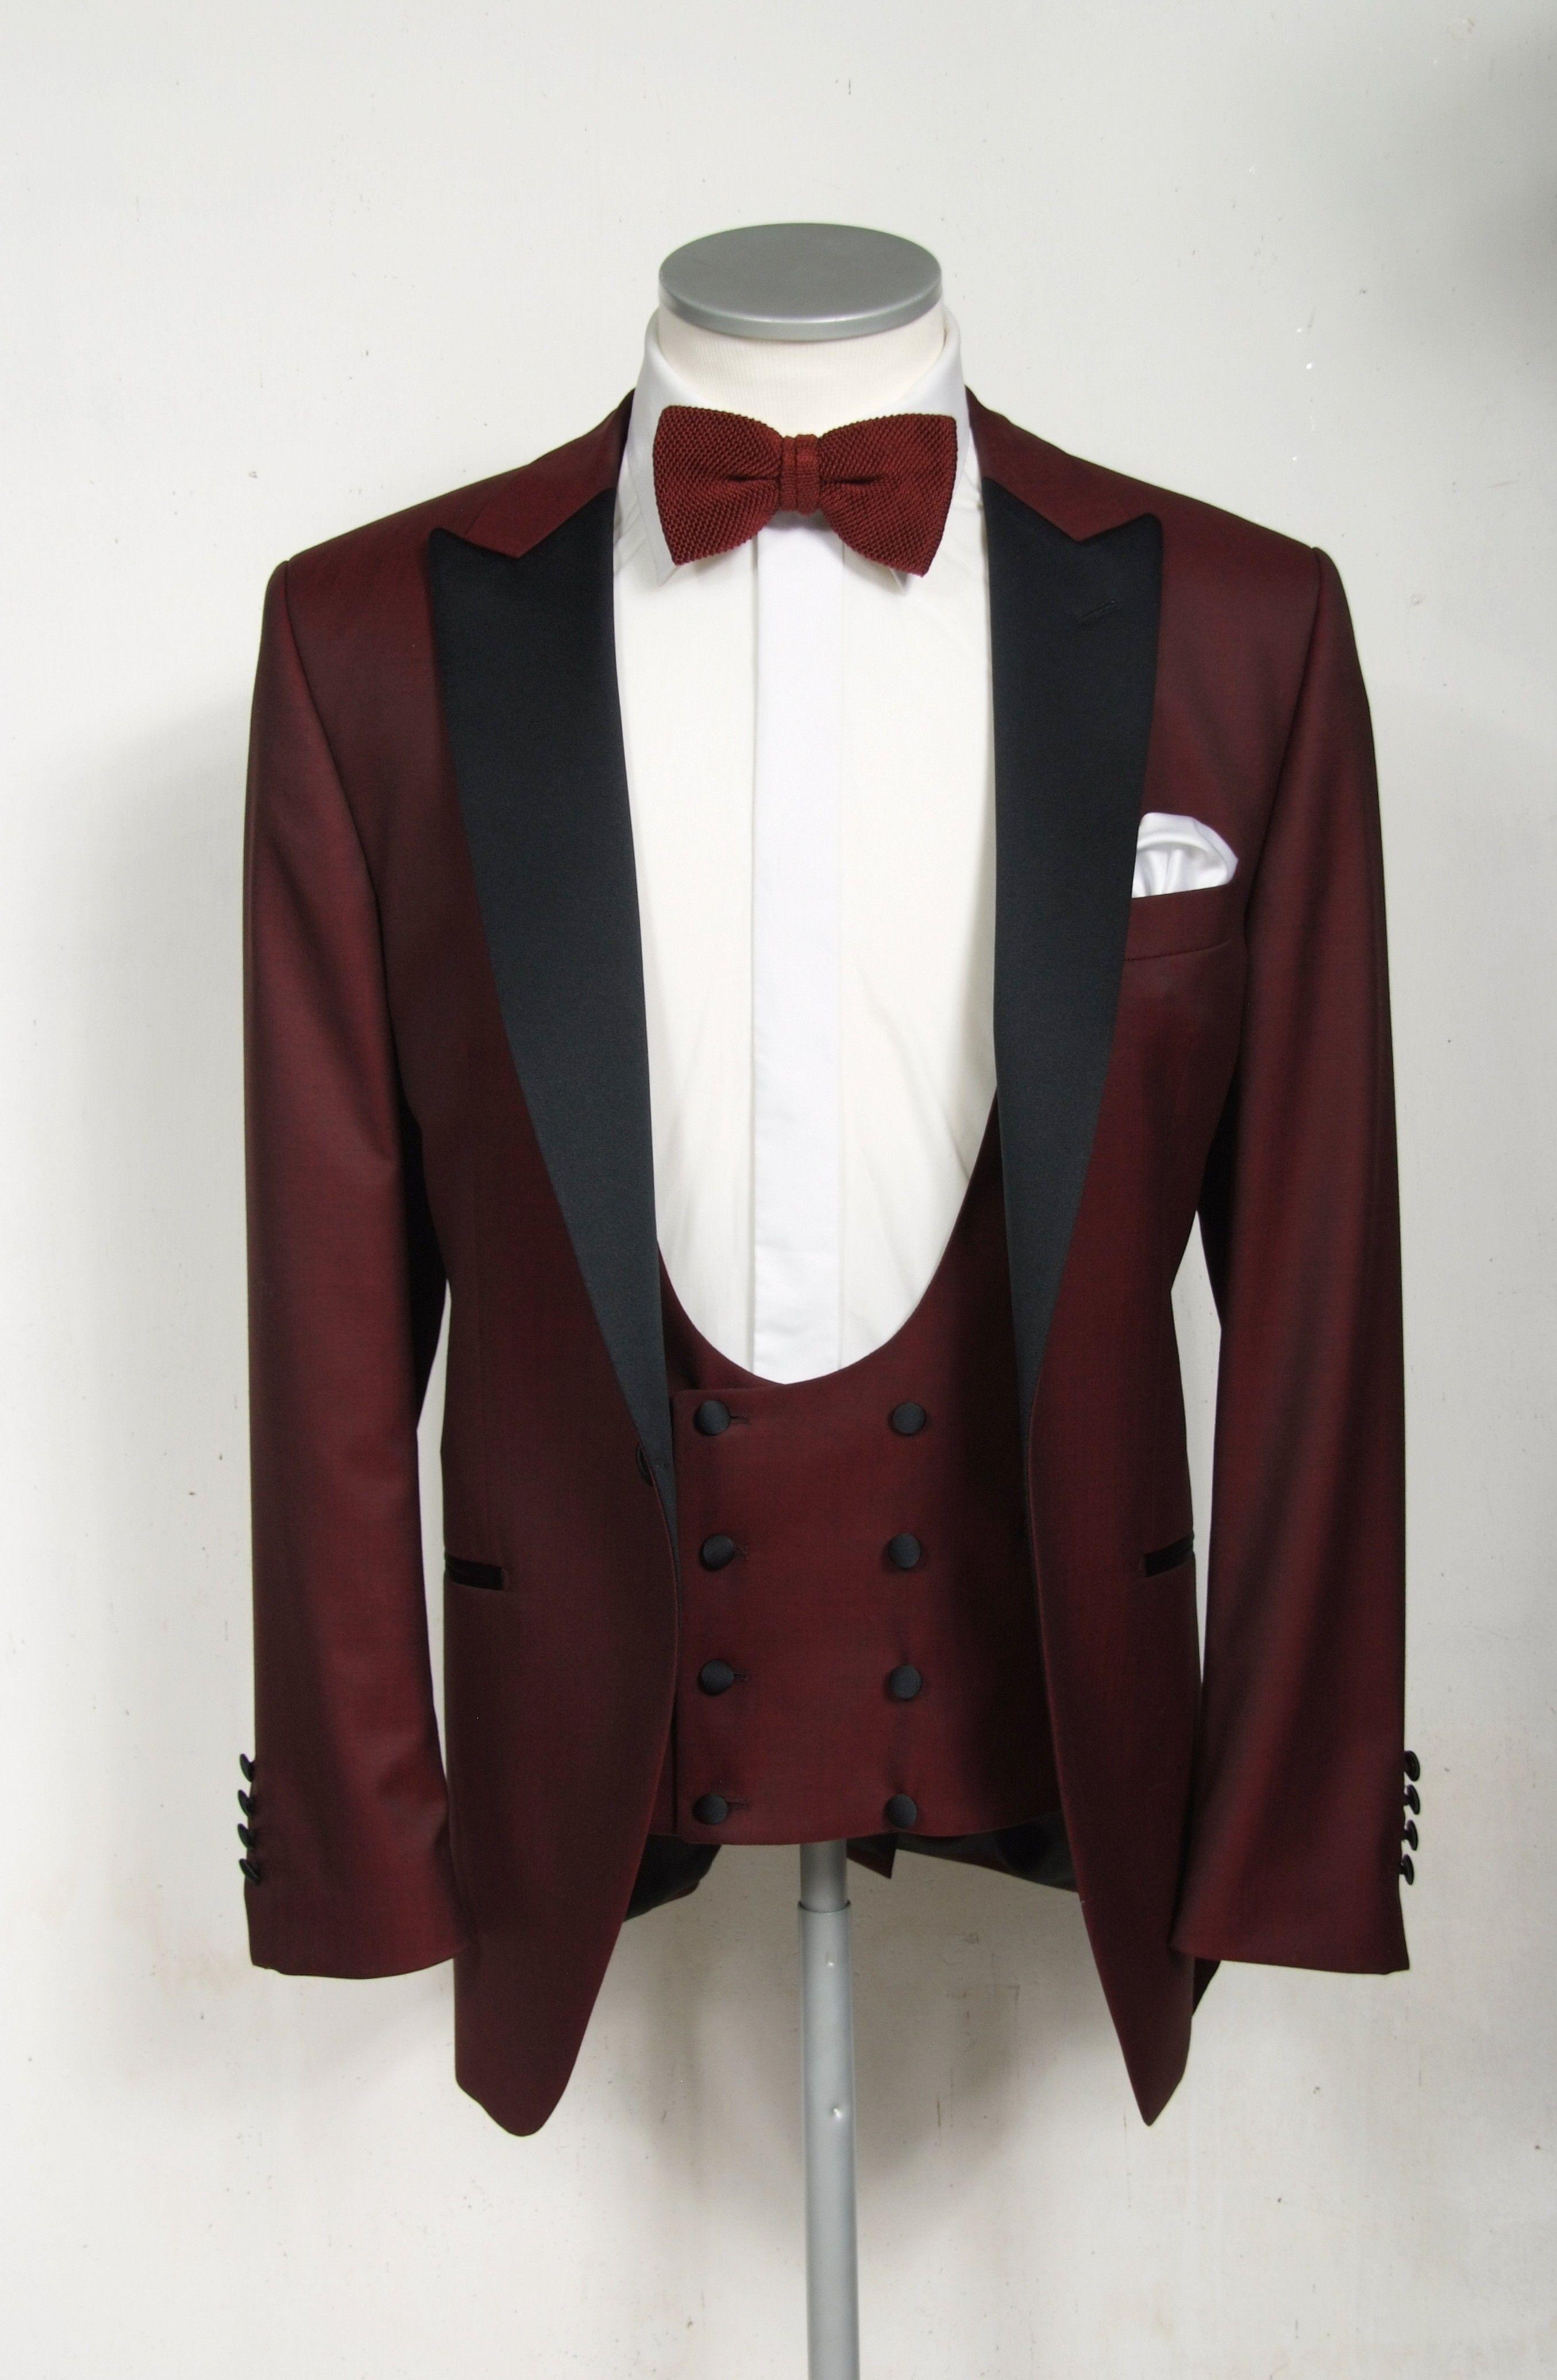 Burgundy Dinner Suit Made To Measure Groom Tuxedo Black Stylish